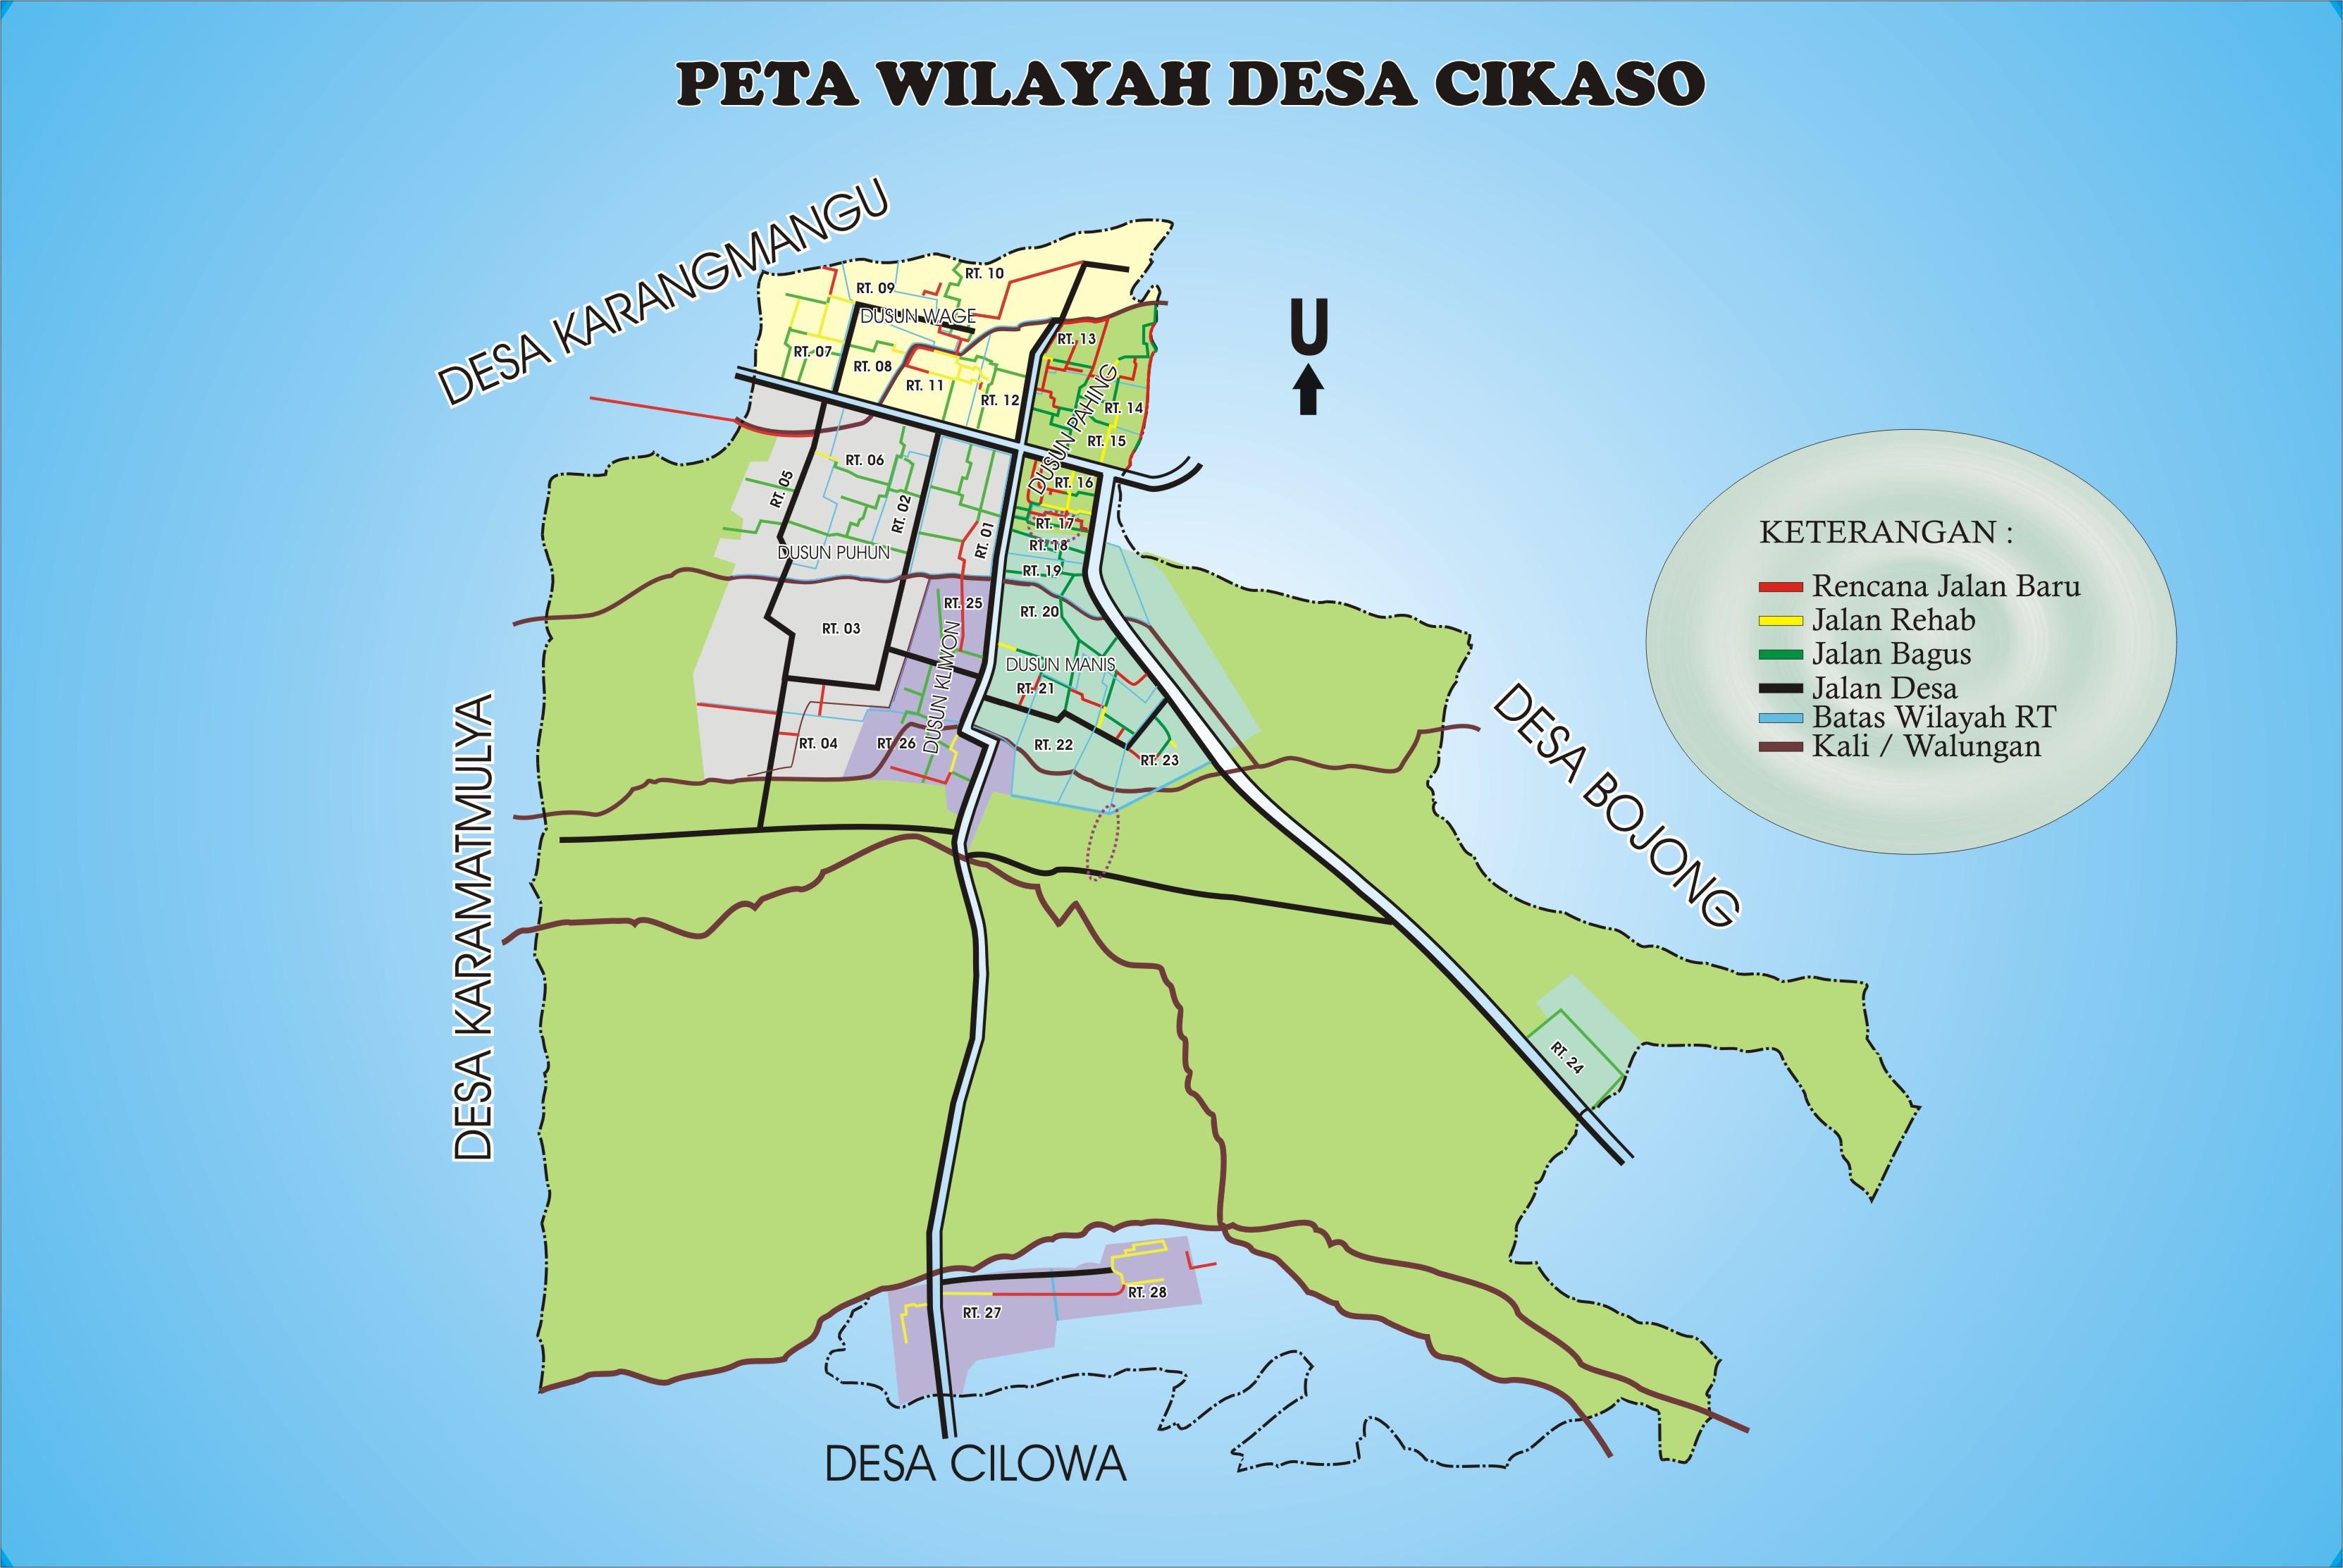 Peta Desa | Desa Cikaso, Kecamatan Kramatmulya, Kabupaten ...